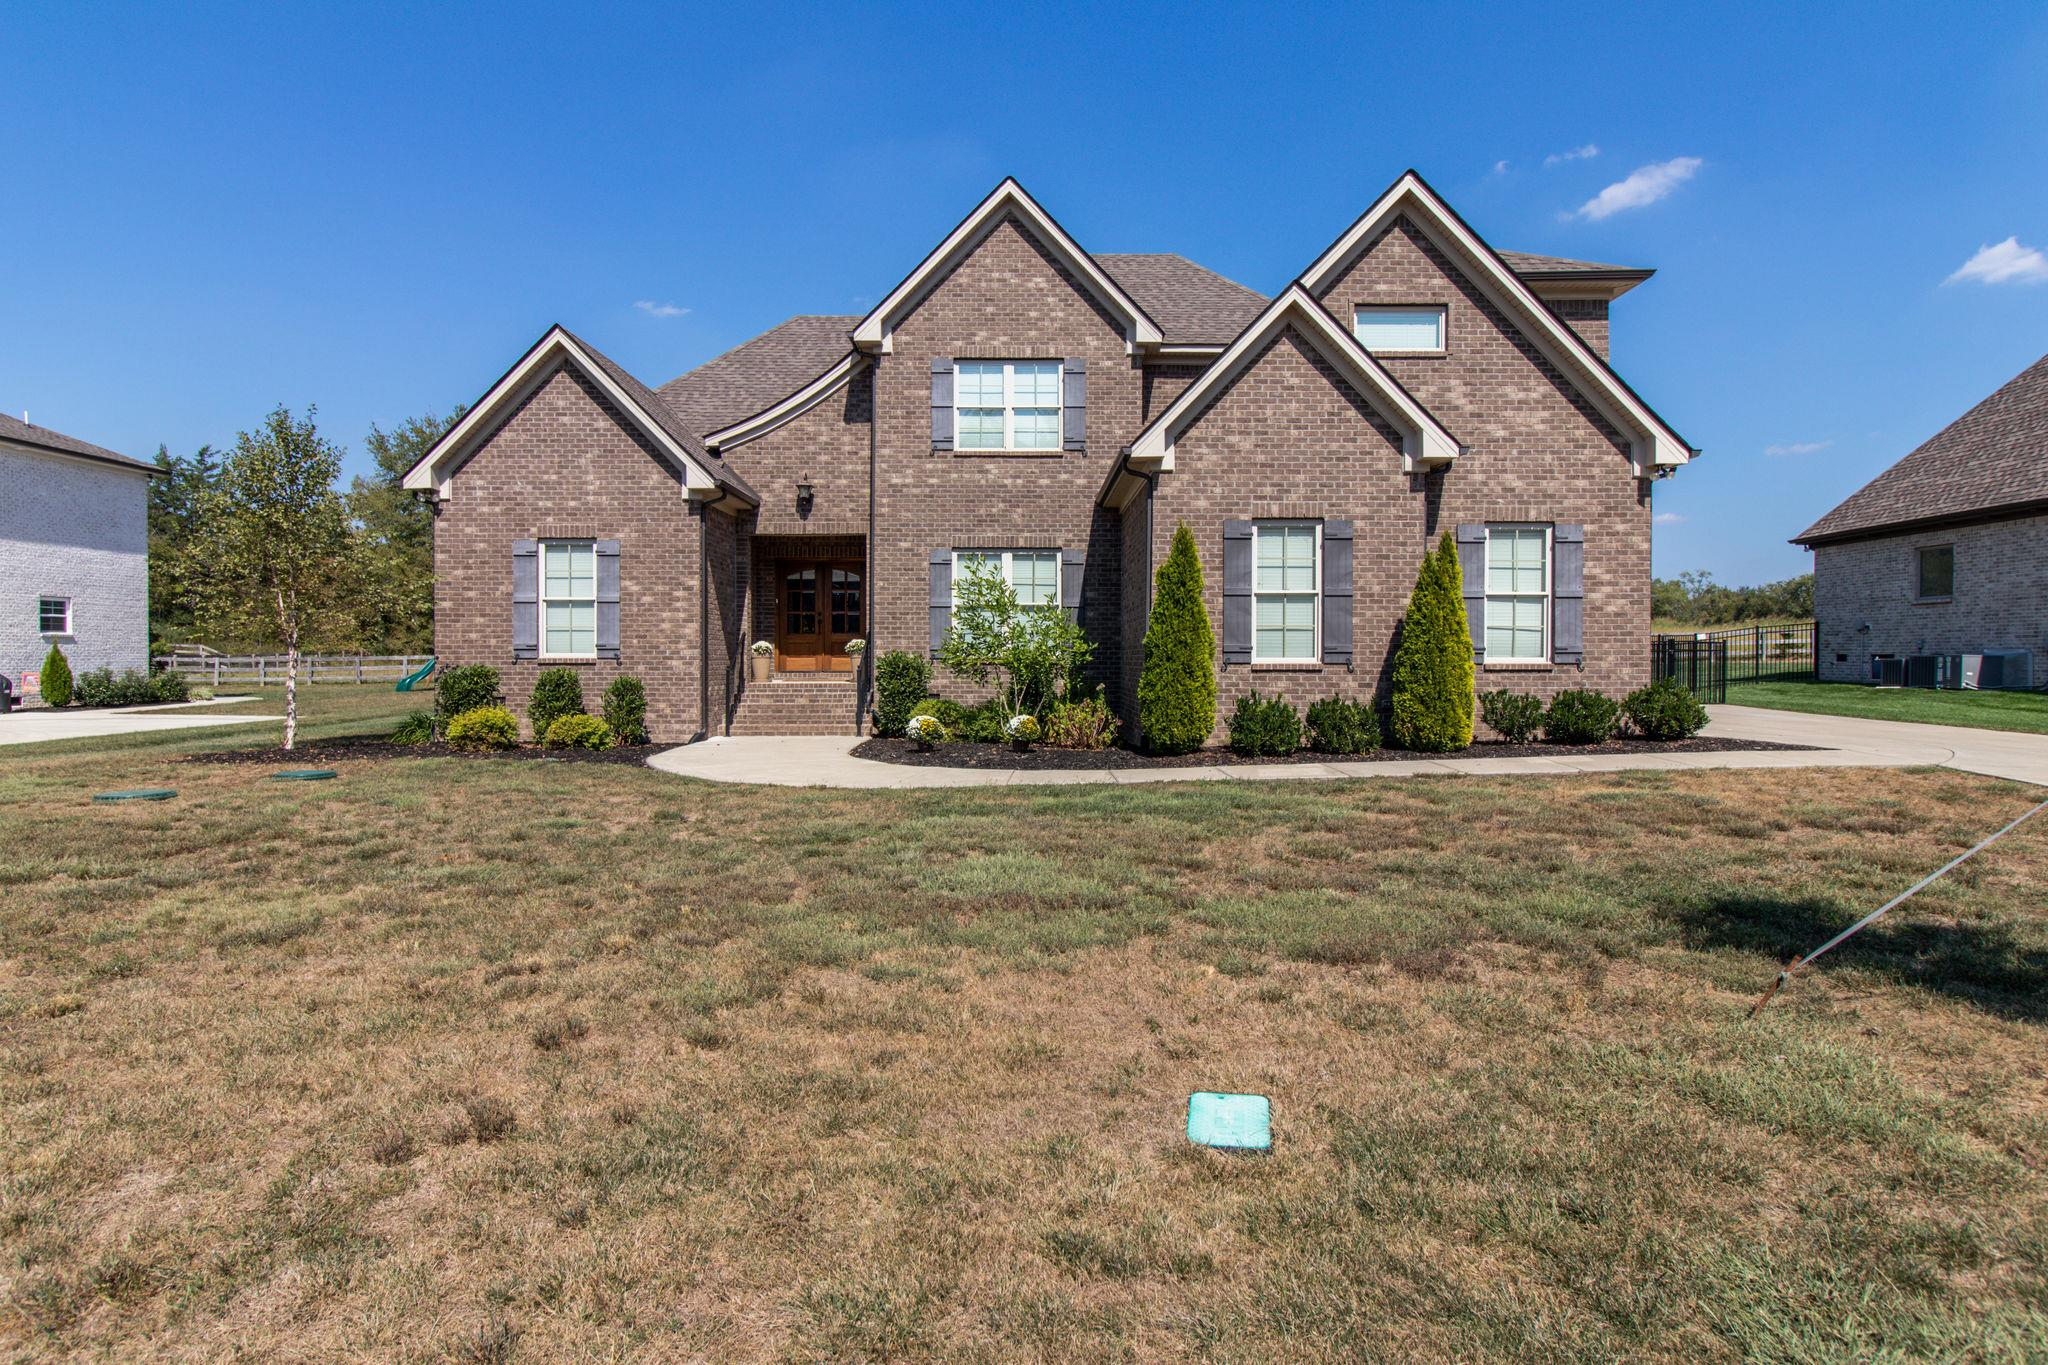 512 Tybarber Ave, Murfreesboro, TN 37129 - Murfreesboro, TN real estate listing